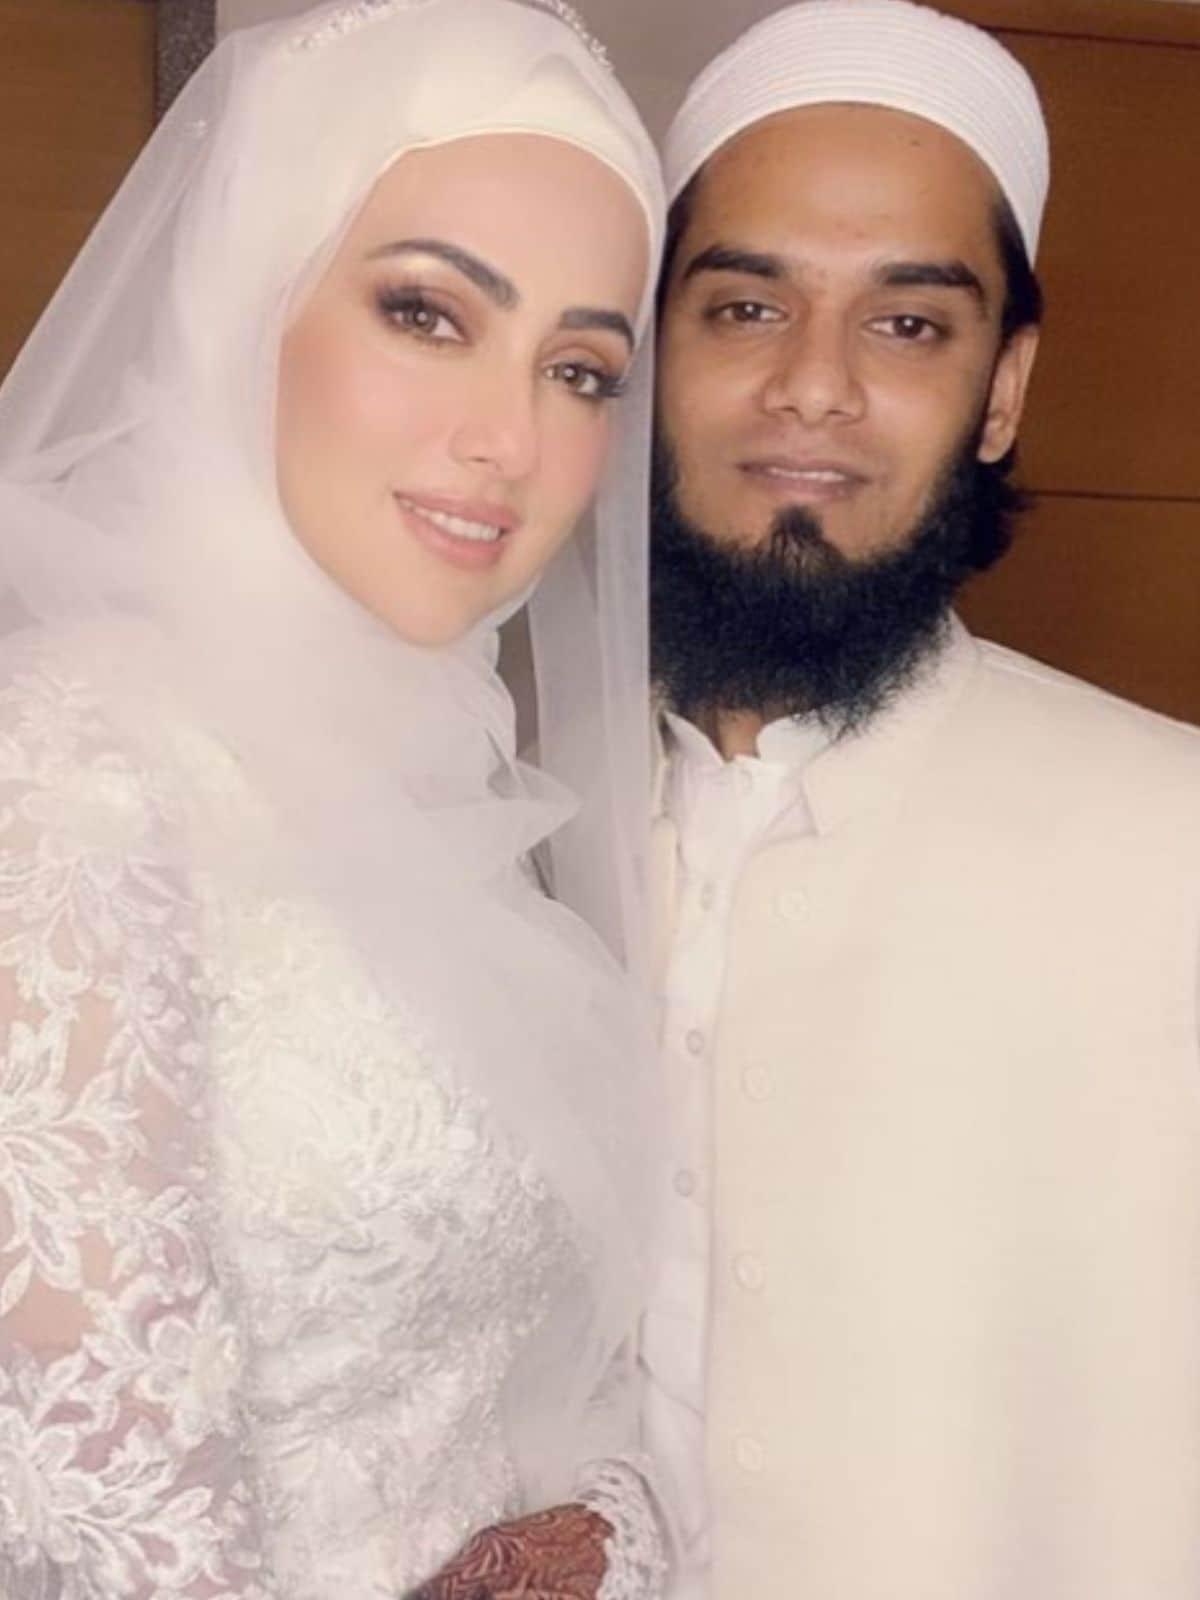 Sana Khan, Sana Khan wedding, Sana Khan husband Maulana Mufti Anas, Sana Khan halal love, Sana Khan news, सना खान, सना खान शादी, सना खान पति मौलाना मुफ्ती अनस, सना खान हलाल प्यार, सना खान खबरें, Hindi News, News18 Hindi, Sana Khan News In Hindi